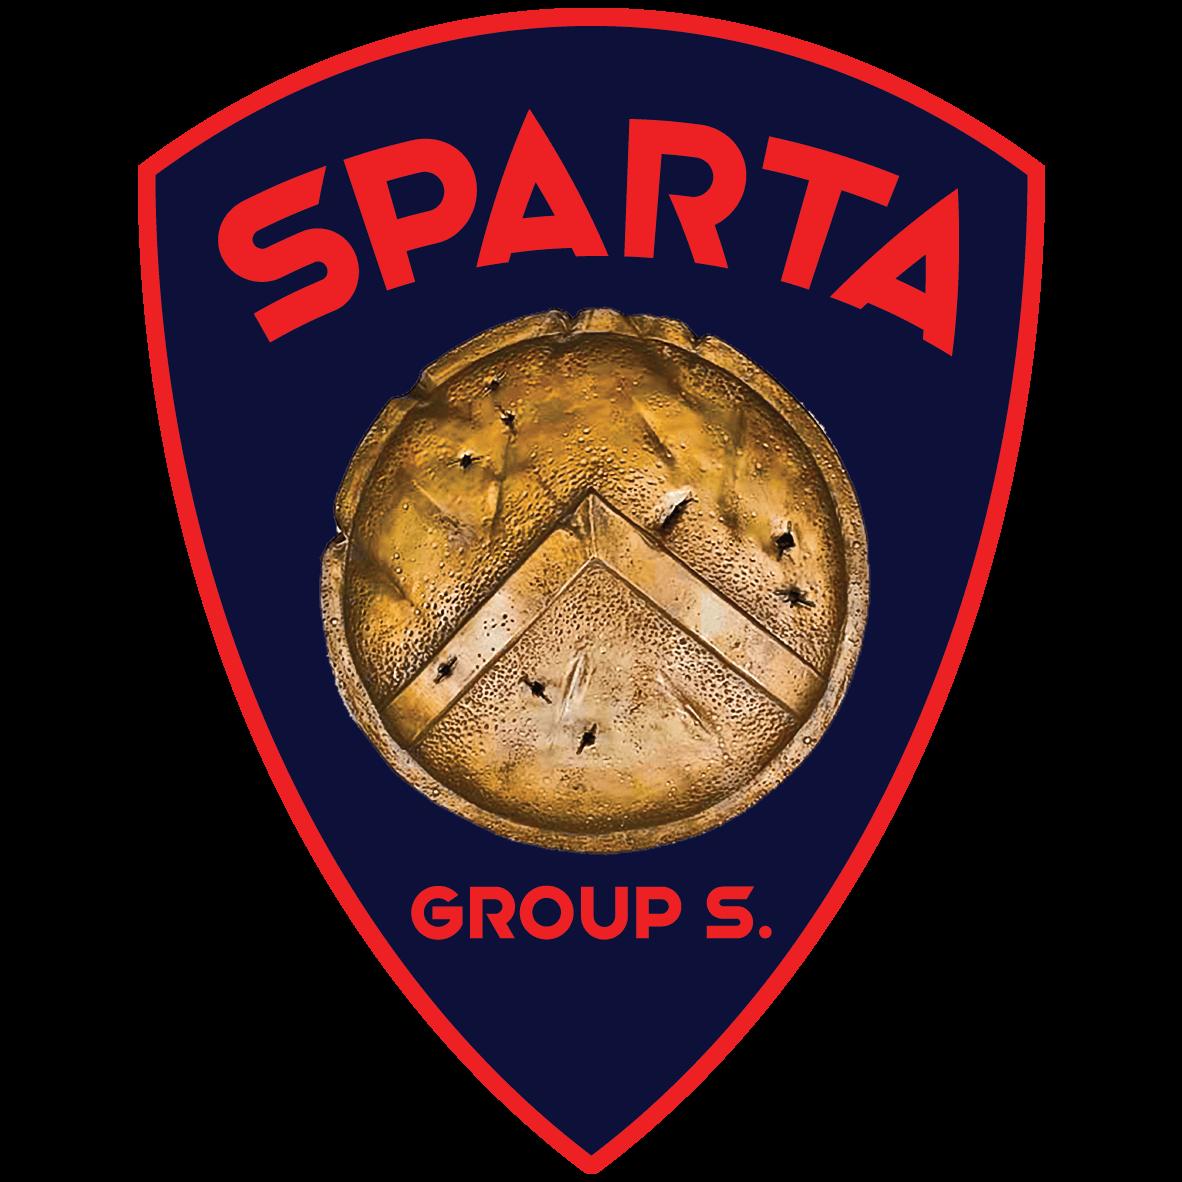 LOGO-Sparta-Group-S.